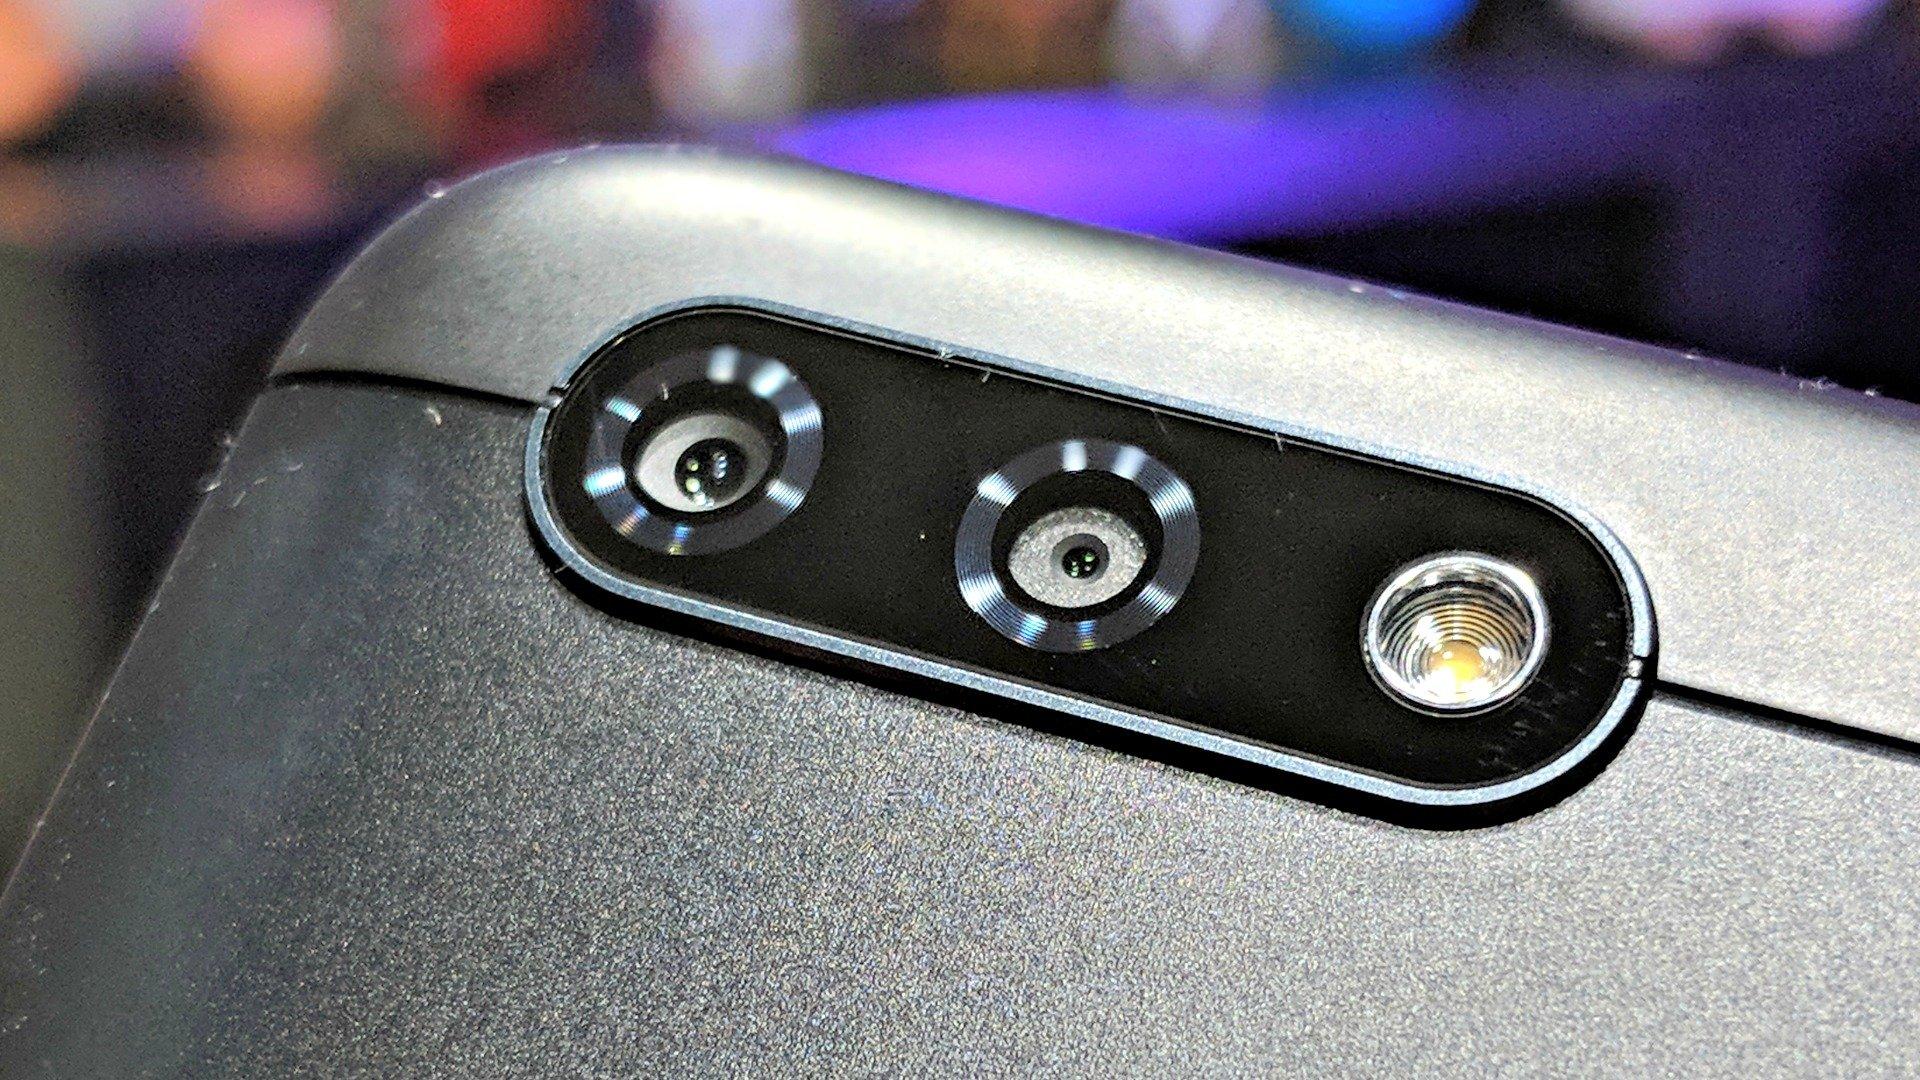 Blu Vivo X Rear Camera